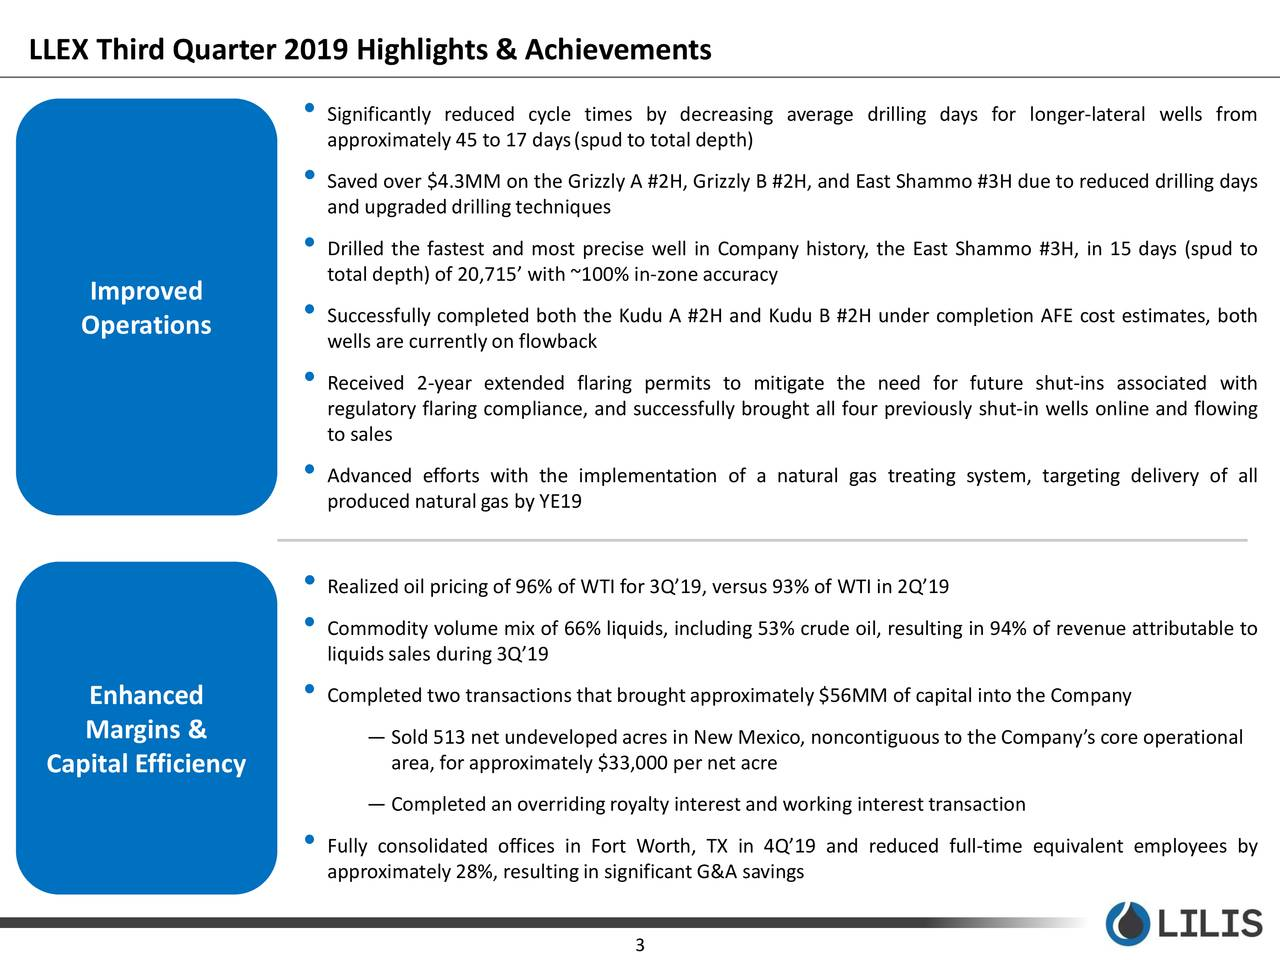 LLEX Third Quarter 2019 Highlights & Achievements